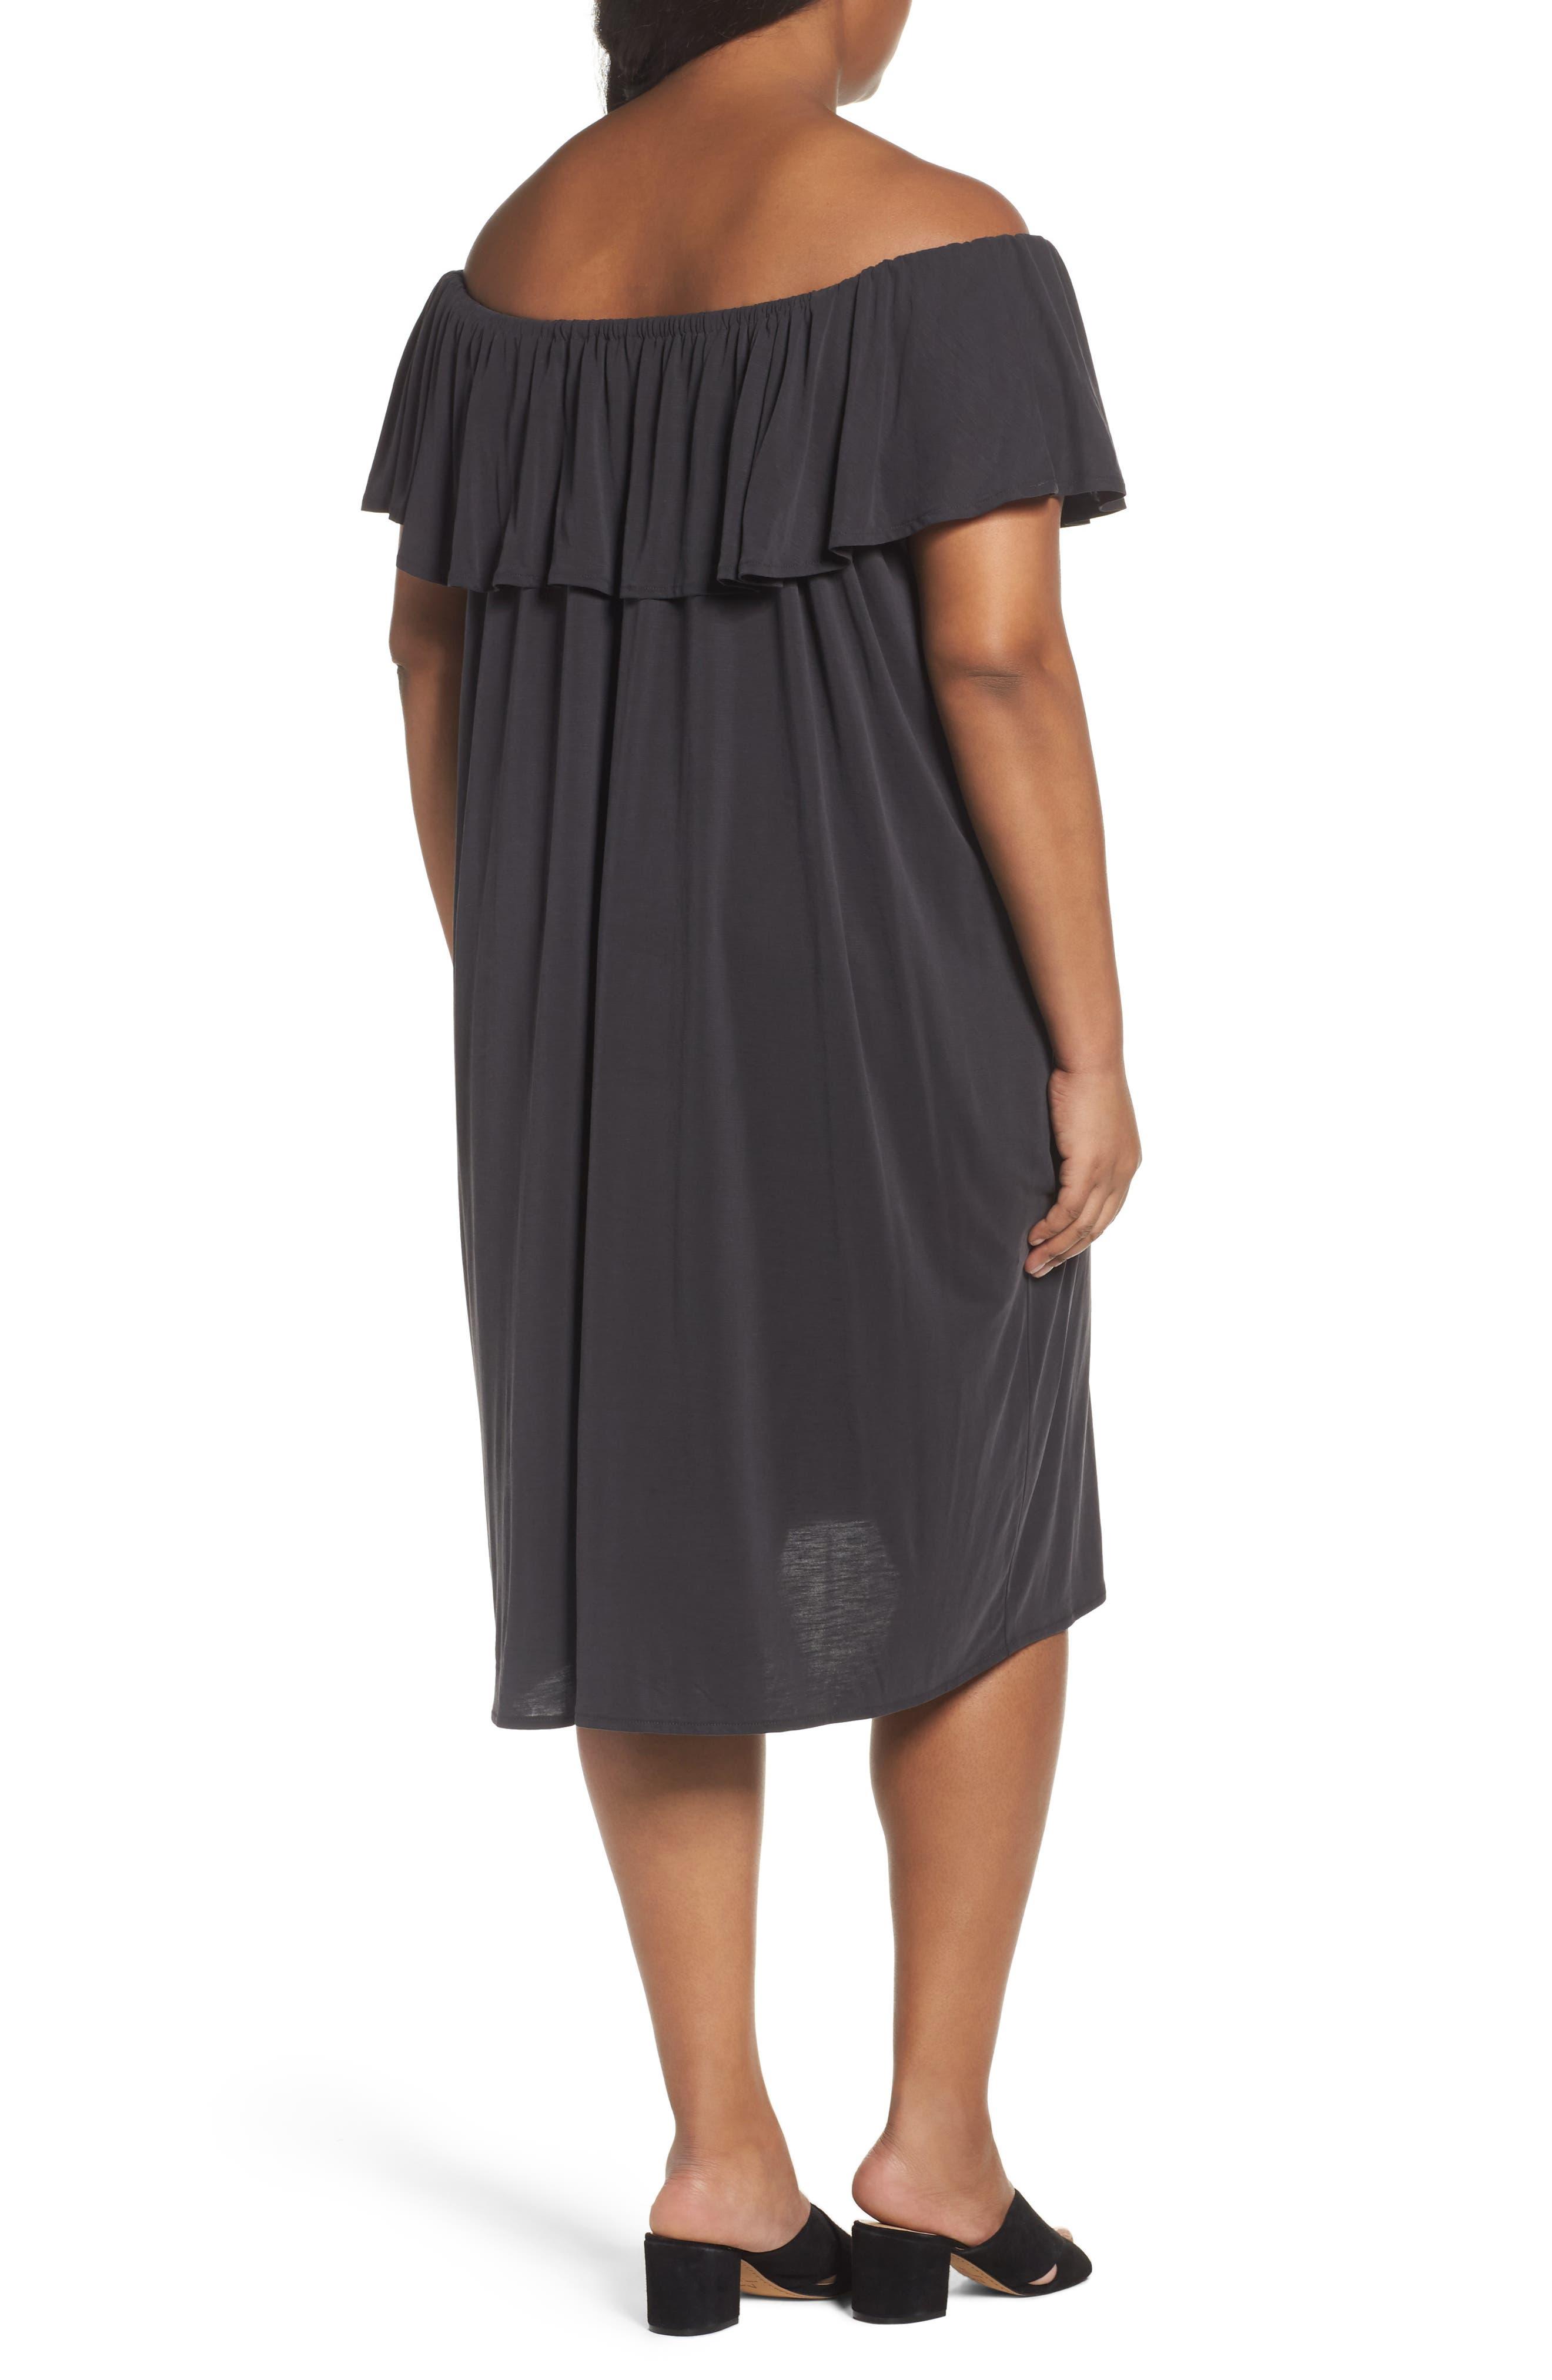 Boardwalk Convertible Jersey Dress,                             Alternate thumbnail 2, color,                             Washed Black